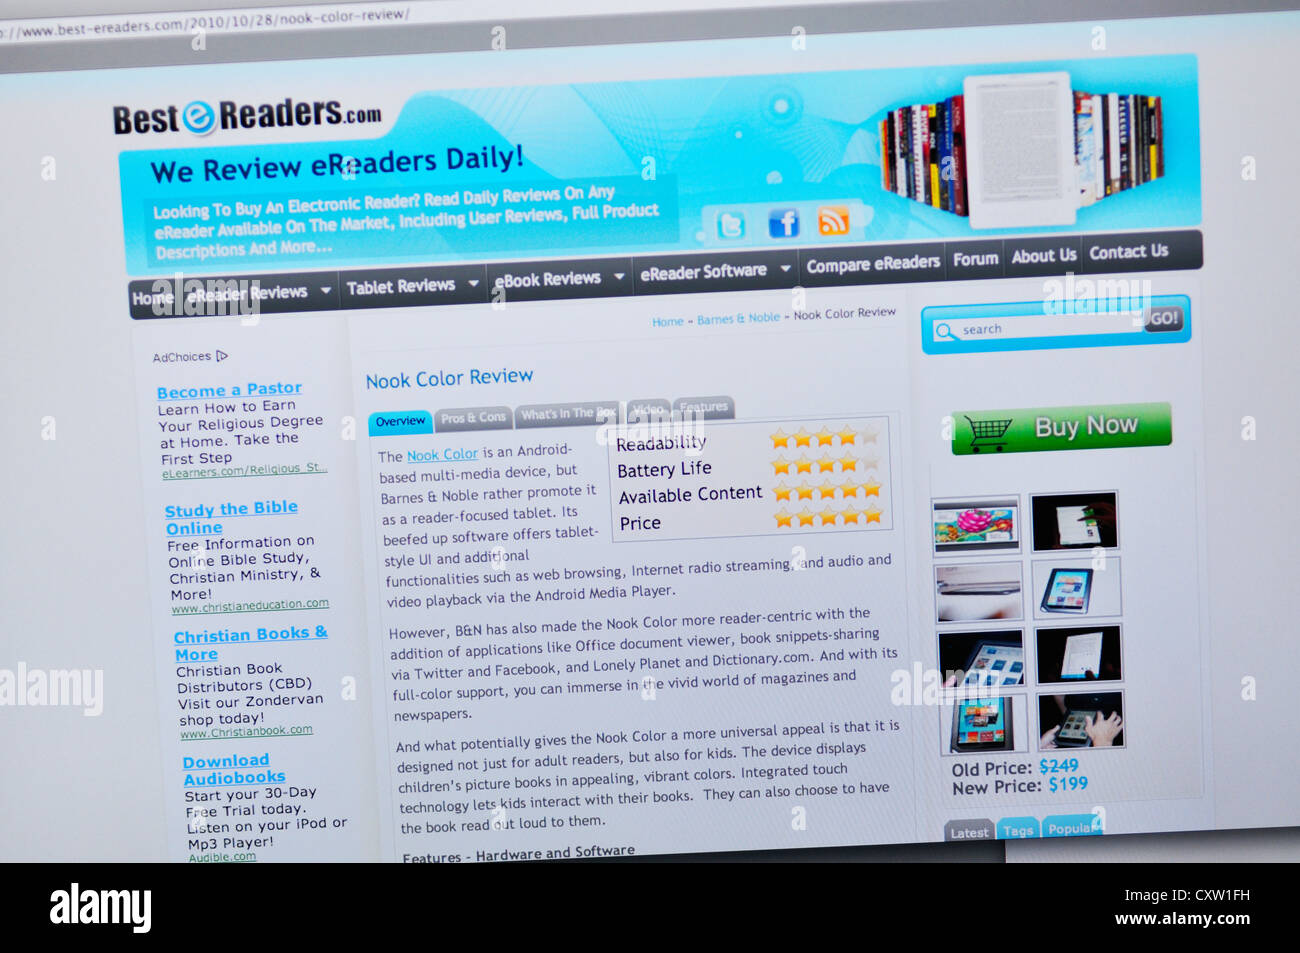 best ereaders website ereader reviews stock image